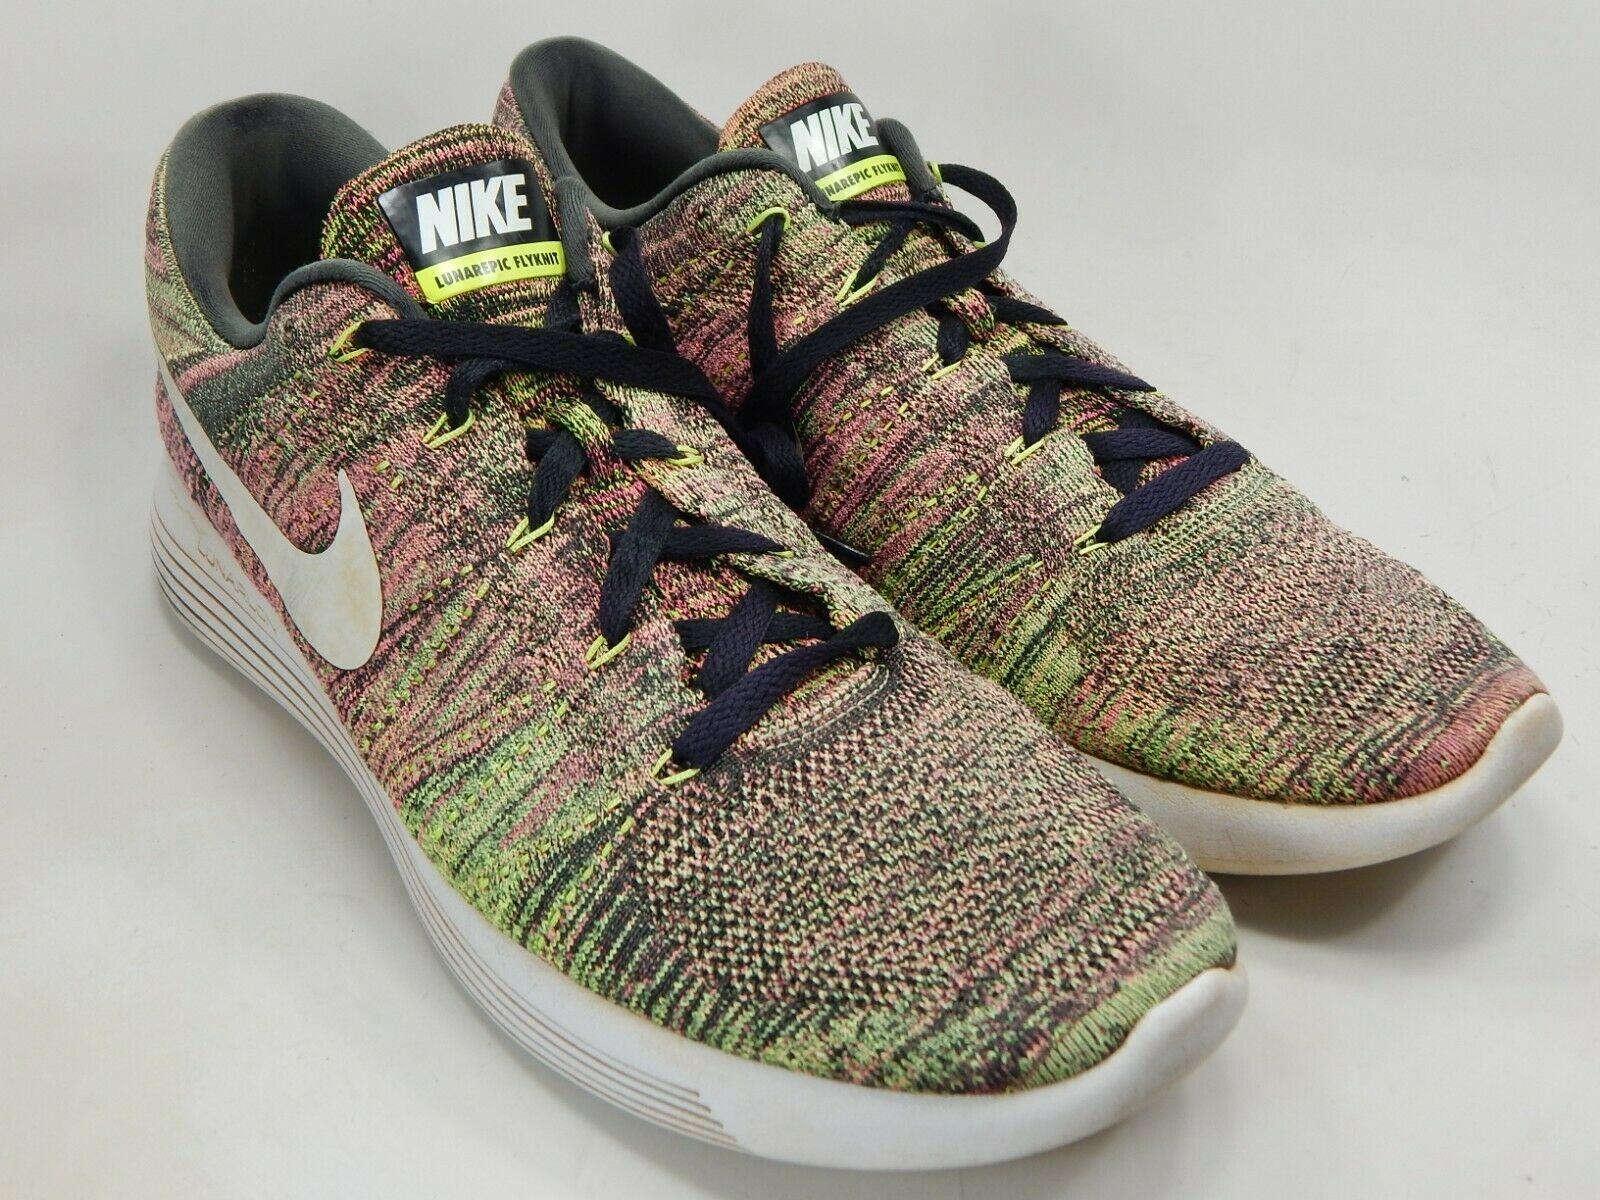 56342995f8efa Nike LunarEpic Low Flyknit Size 14 M (D) EU 48.5 Men s Running Shoes ...